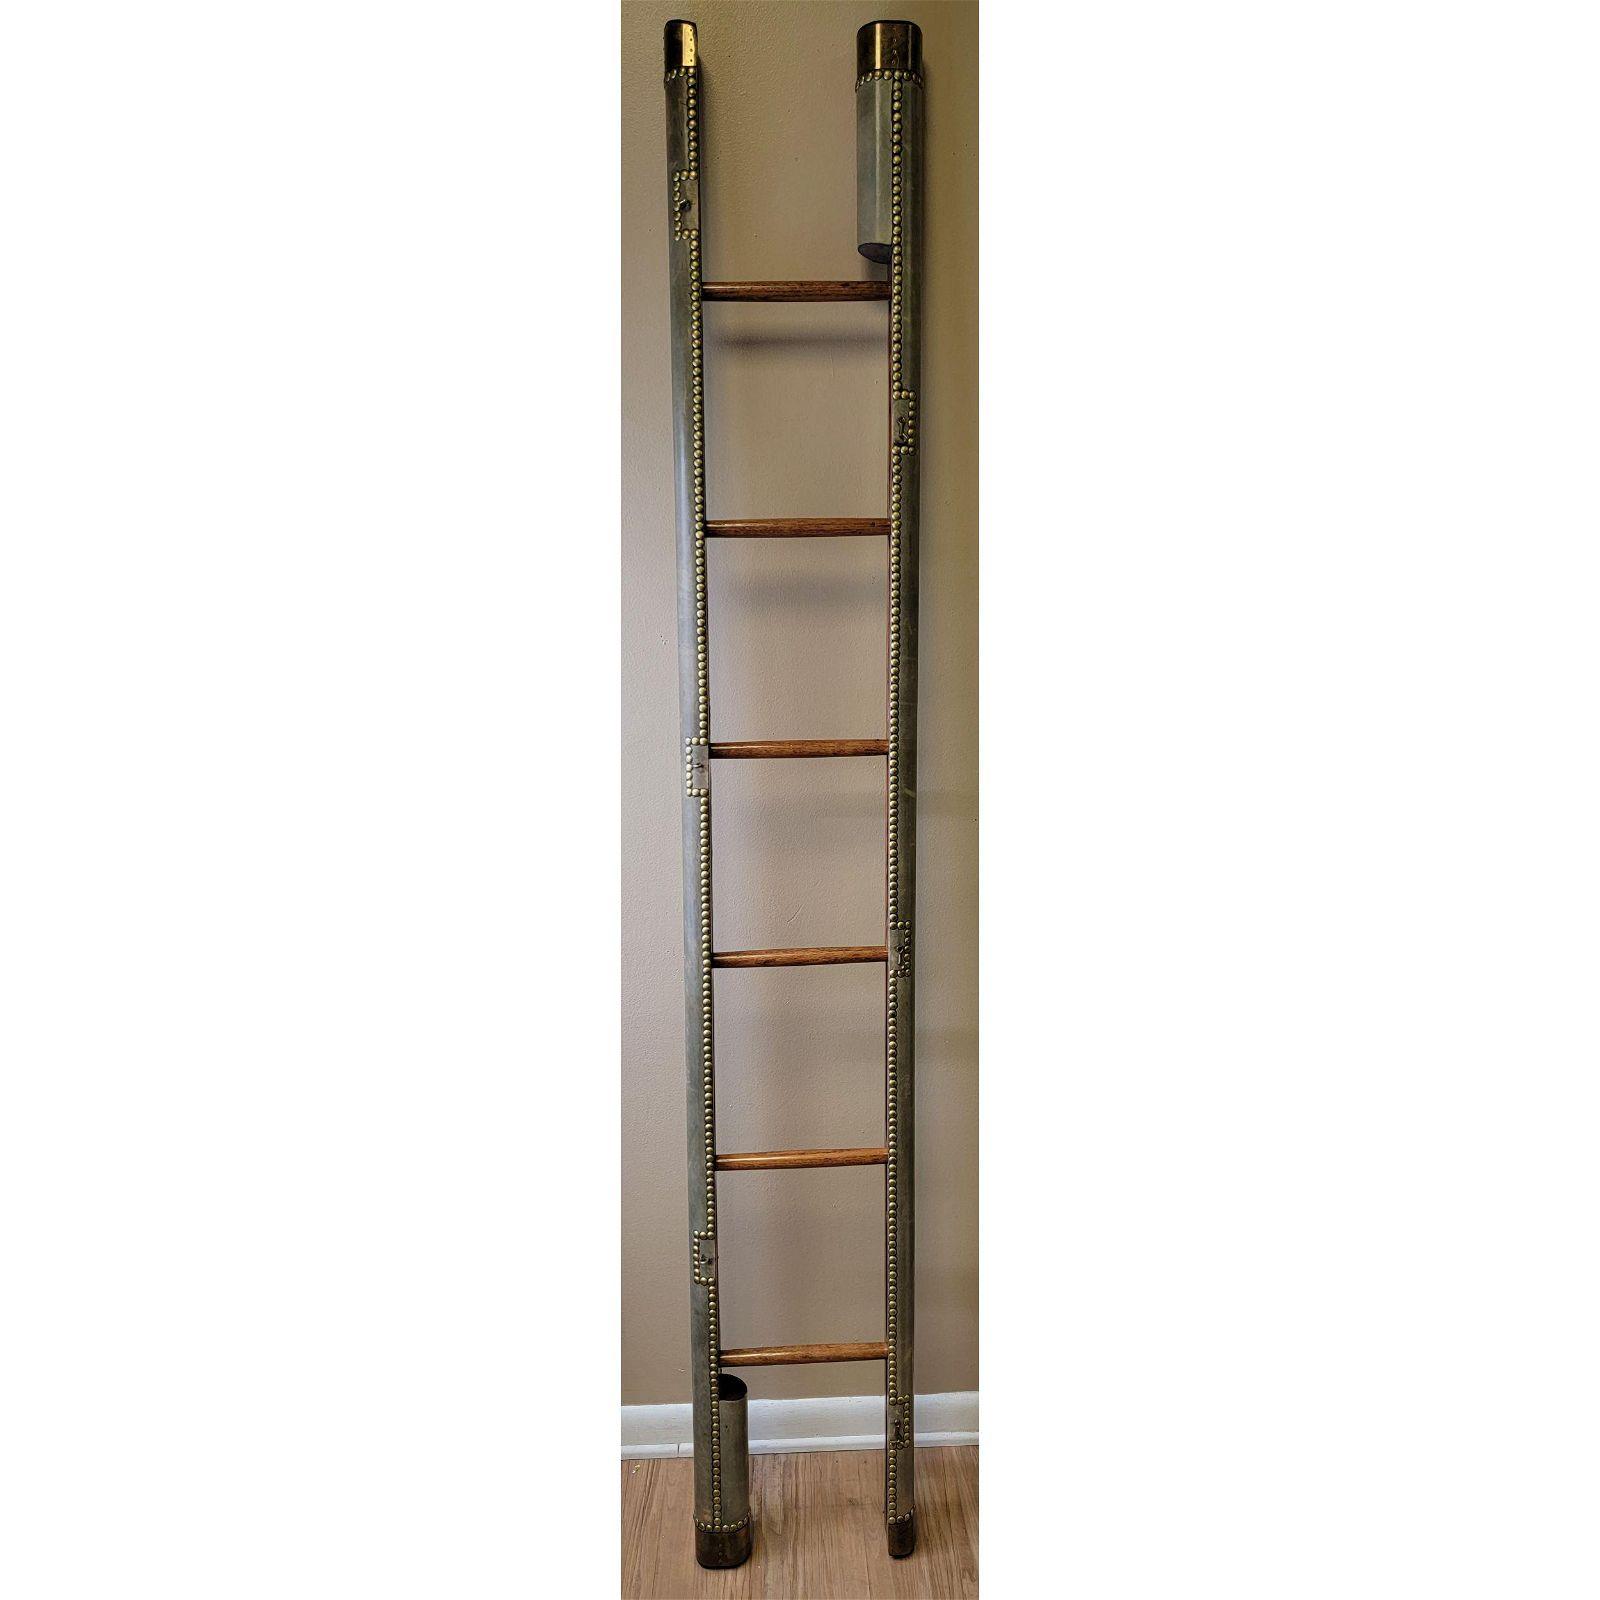 English Regency Style Folding Library Pole Ladder